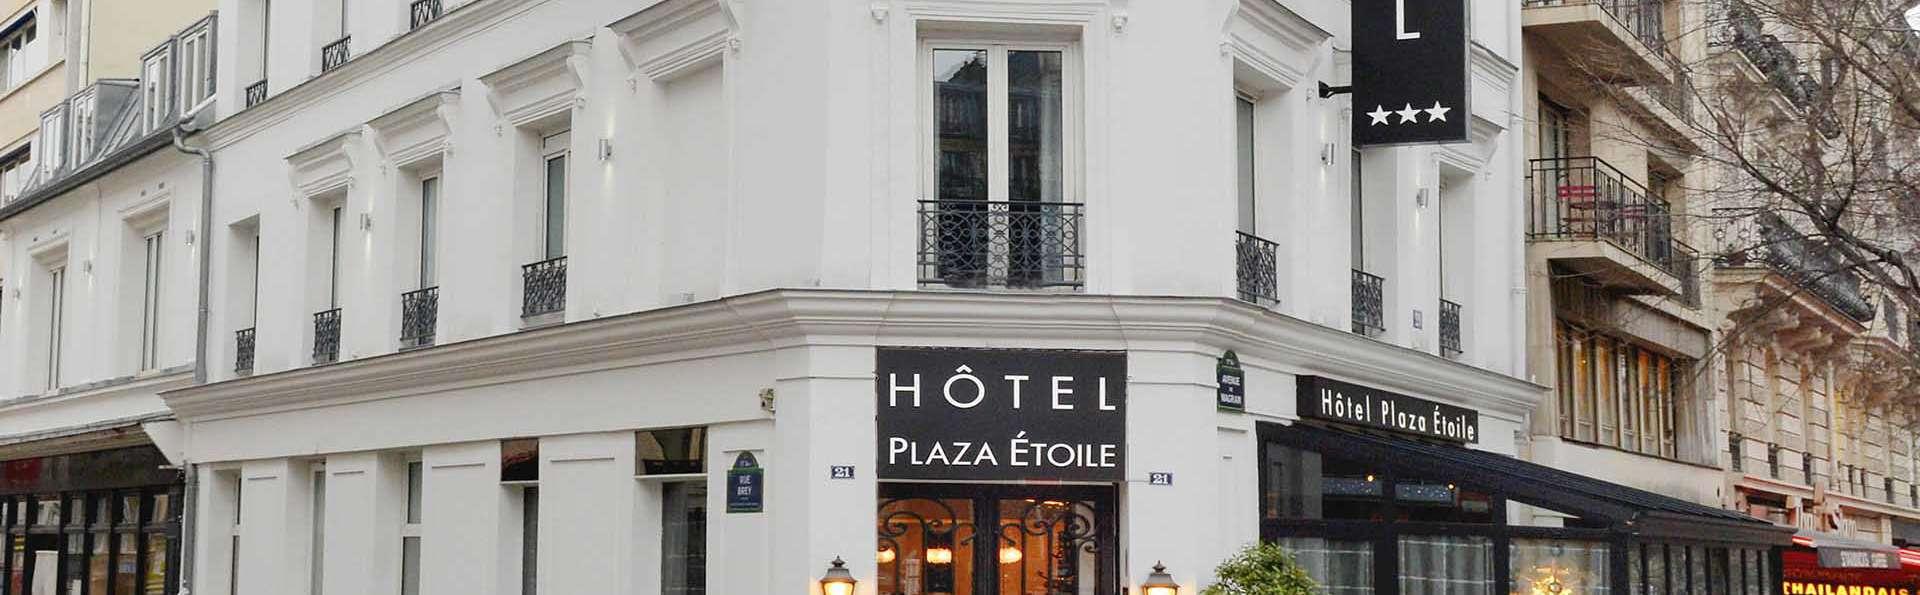 Hôtel Plaza Etoile - EDIT_Front_01.jpg